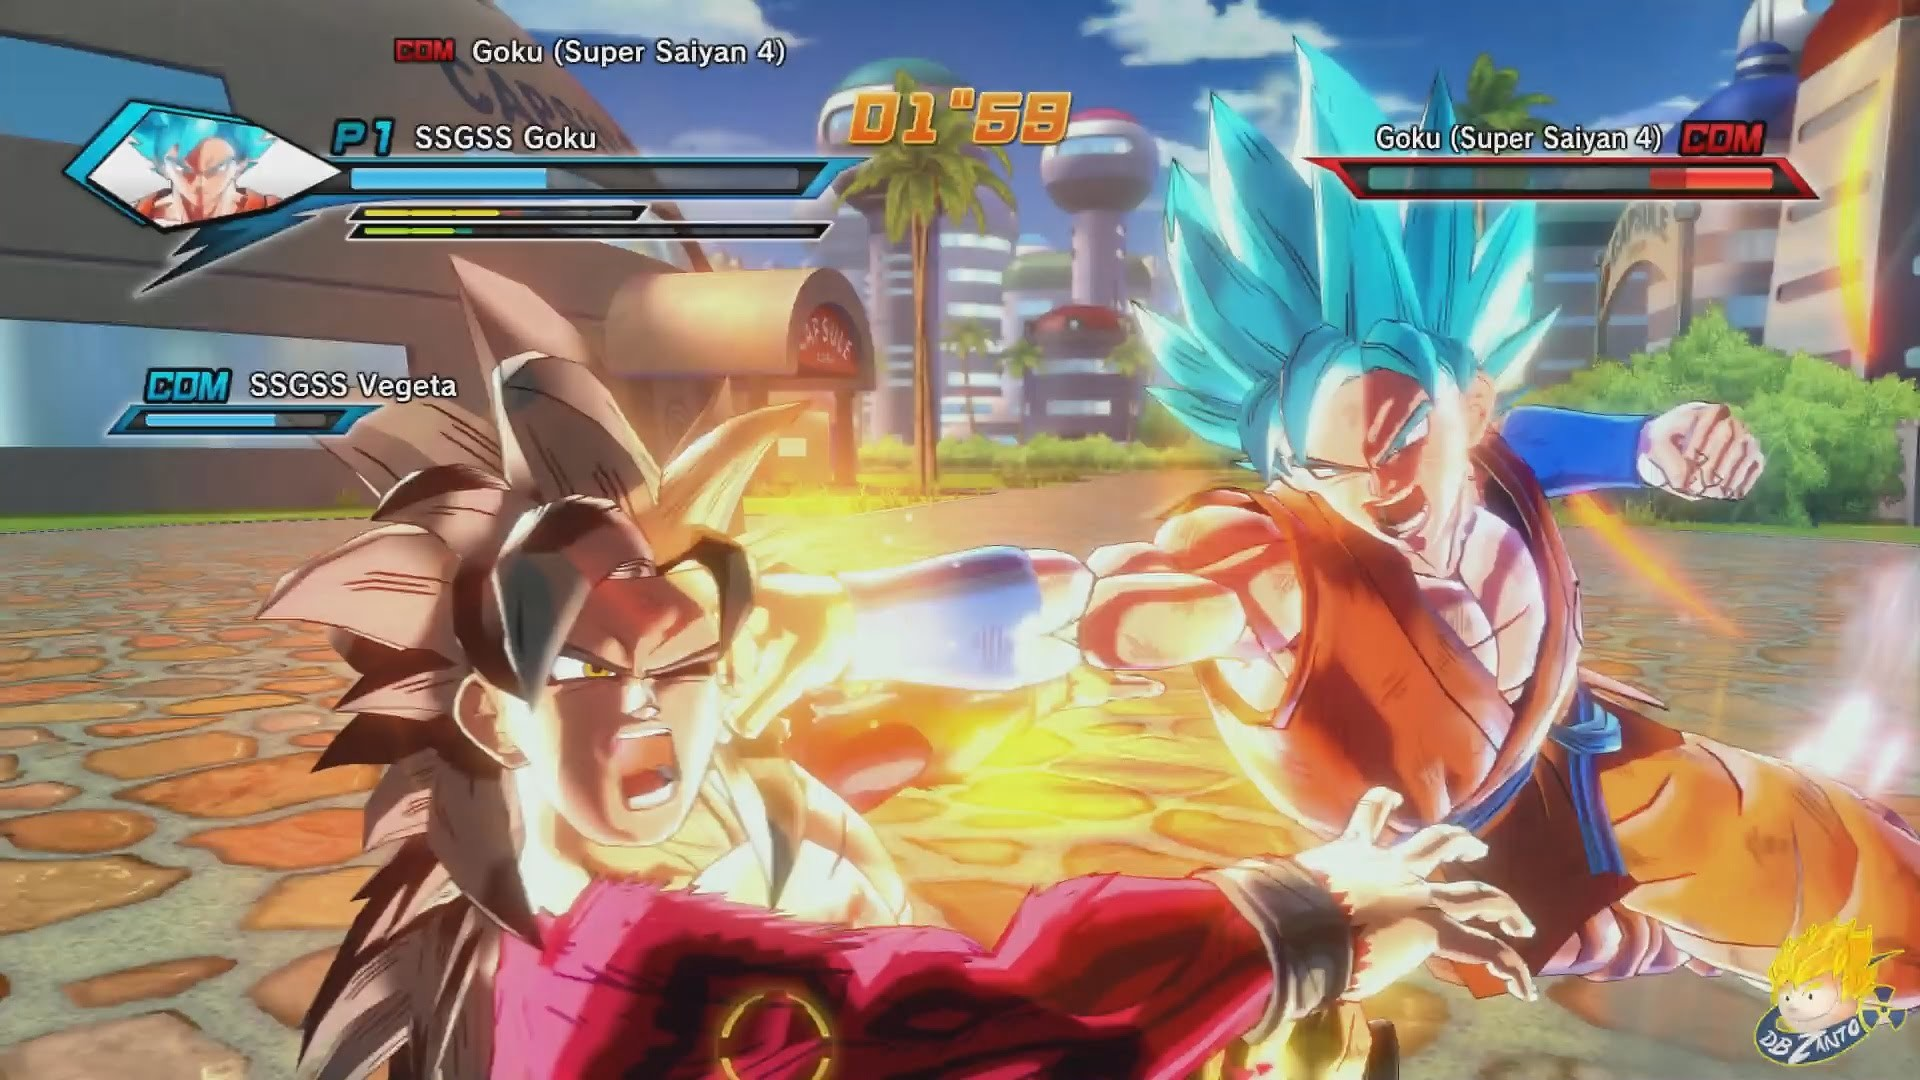 Dragon Ball Xenoverse (PC) : SSGSS Goku & SSSG Vegeta Vs SSJ4 Goku & SSJ4  Vegeta【60FPS 1080P】 – YouTube